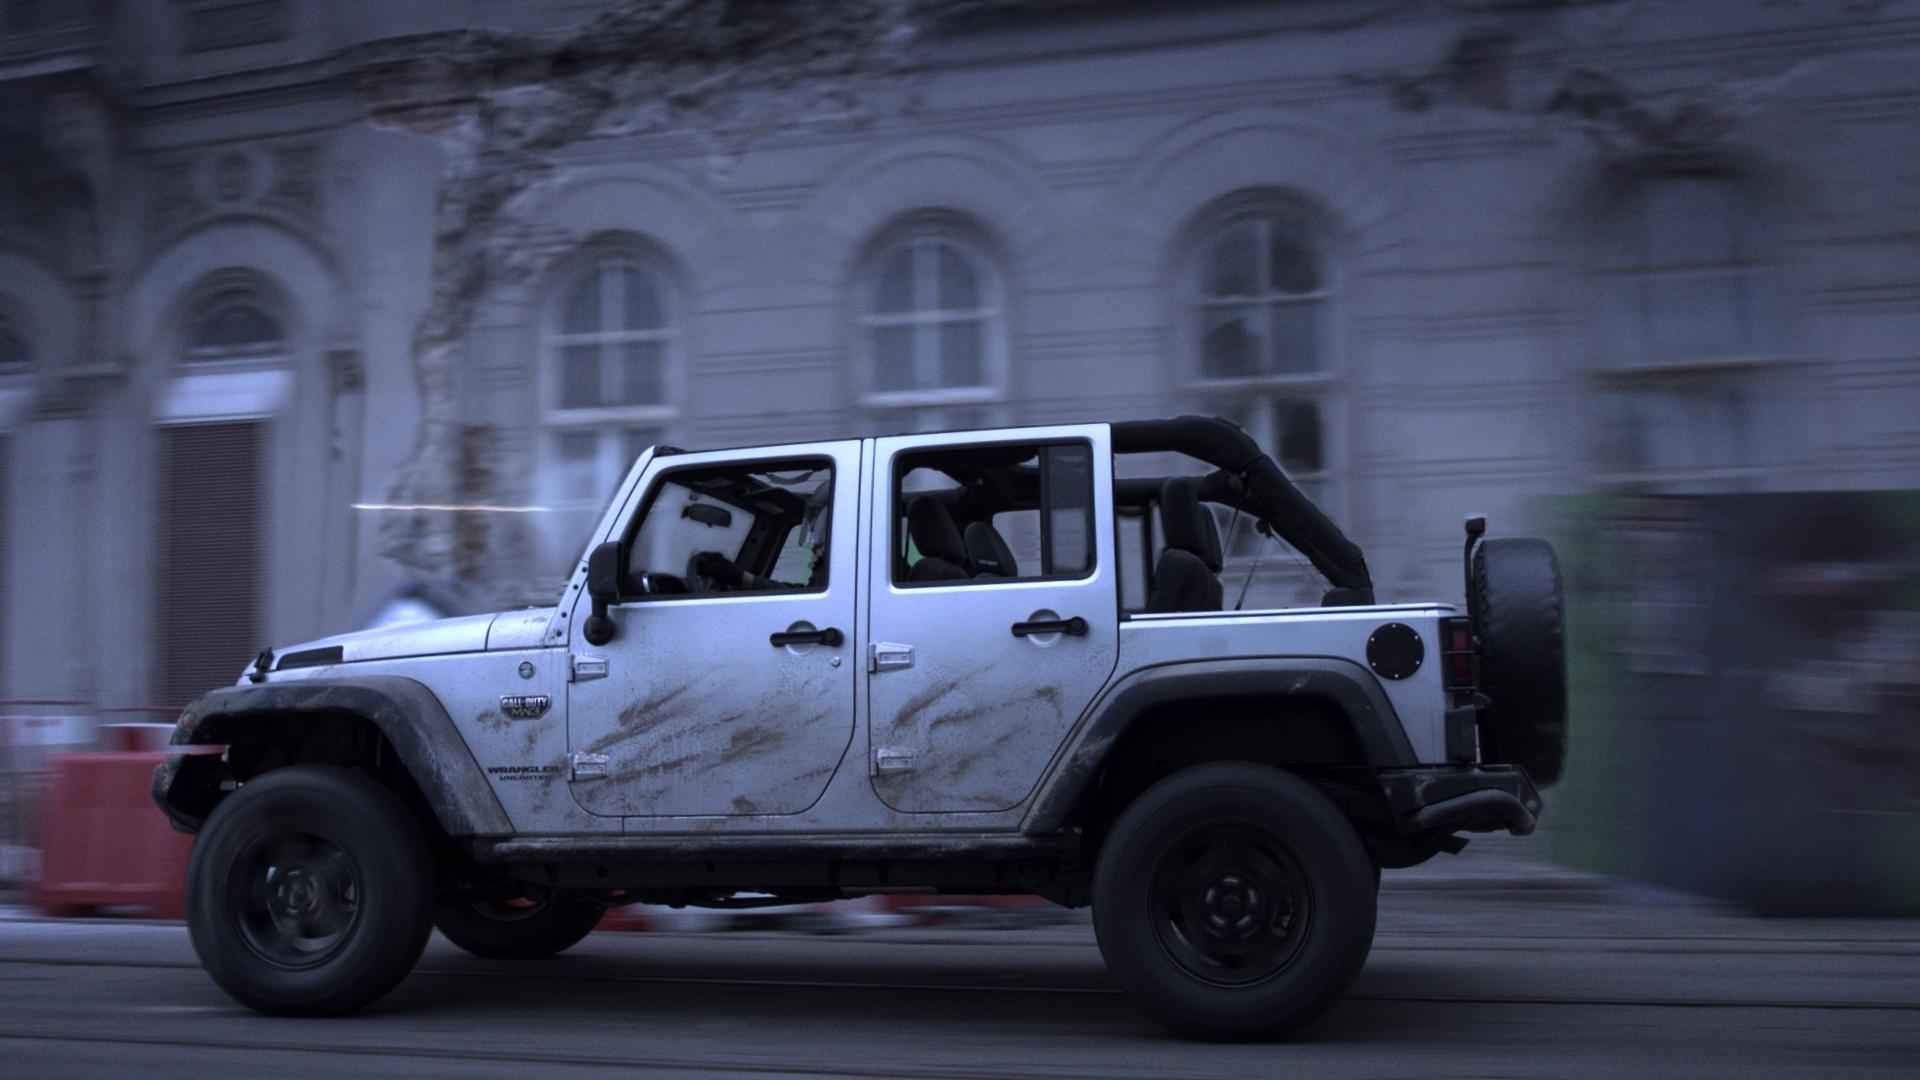 2012 Jeep Wrangler Call Of Duty Modern Warfare 3 Cod Mw3